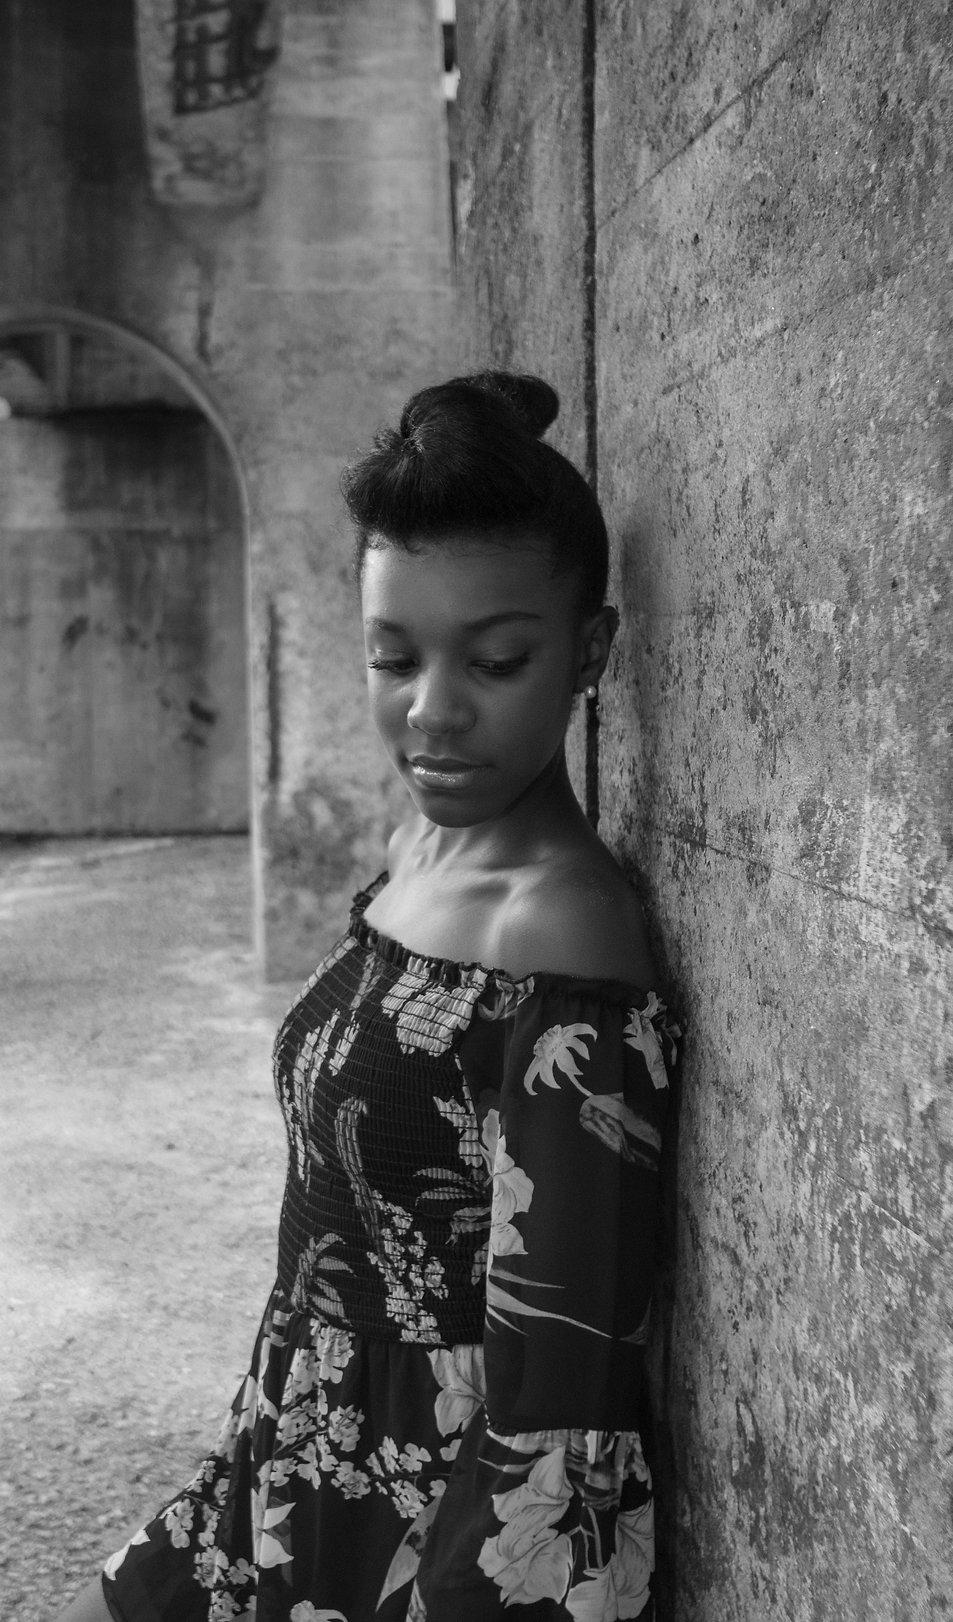 black, black girl, african american, photography, black photographer, color,model, blackmodel, black female model, winstonsalem, pearls, teenager, black teenager, dancinggrass, dancinggrassstudios, dgs, blackgirlmagic, industrial, downtown, dtwsnc, baileypark, innovationquarters, outside, natural, naturalhair, androgynous